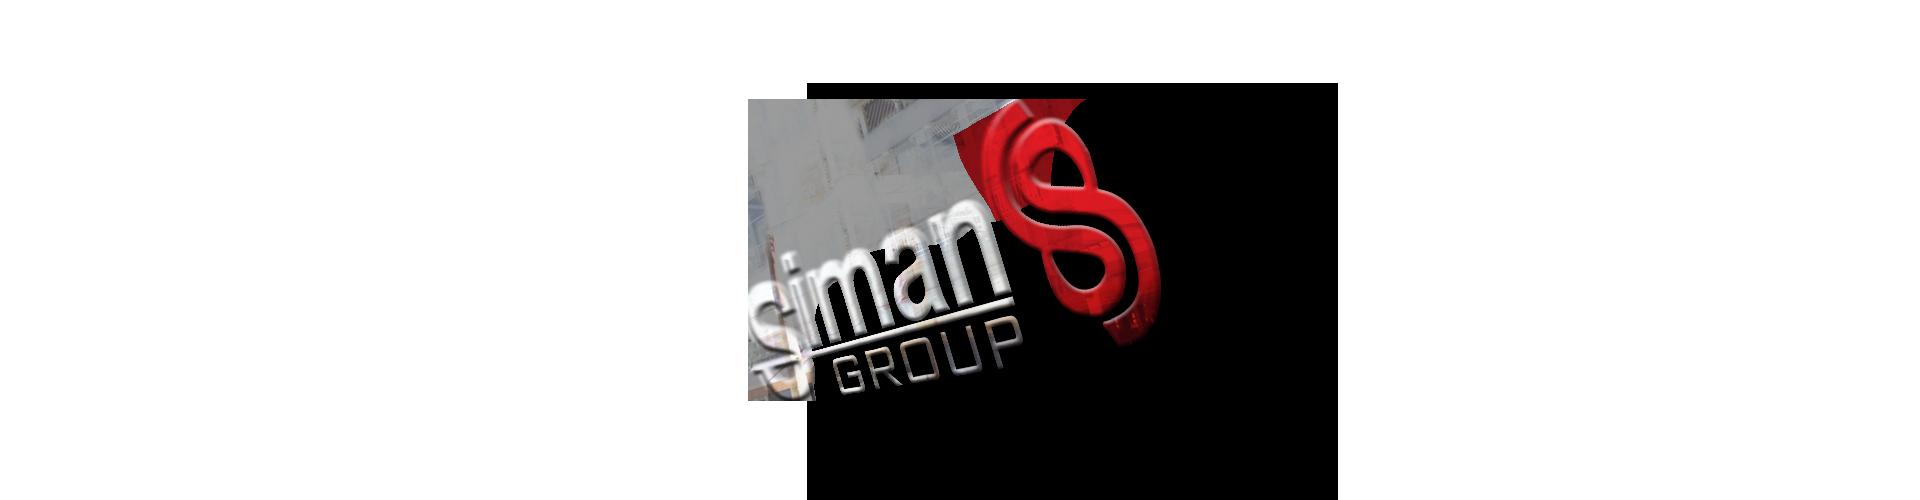 simangroup_logo.png